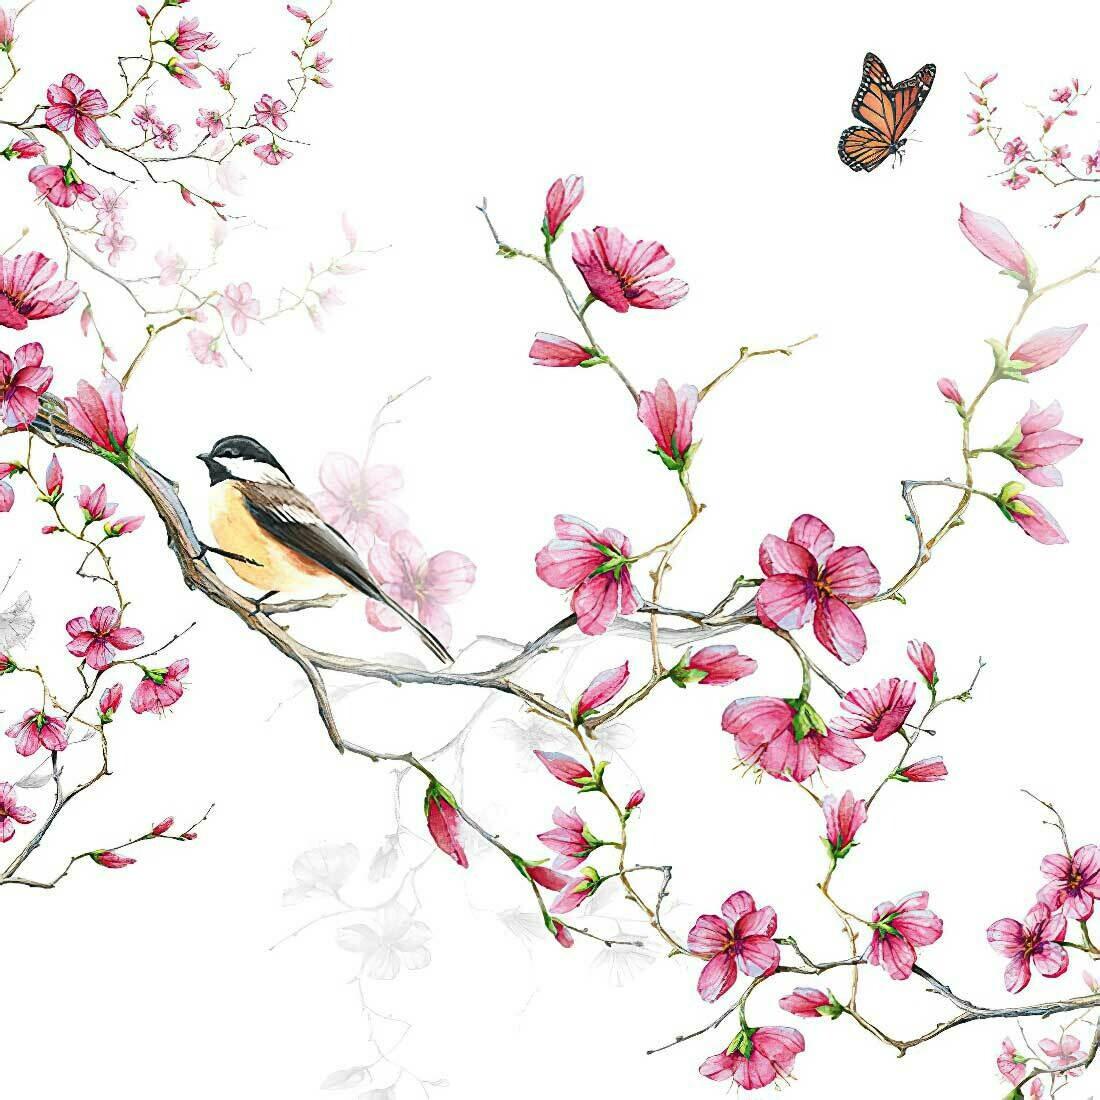 Decoupage Paper Napkins - Bird & Blossom White (1 Sheet)